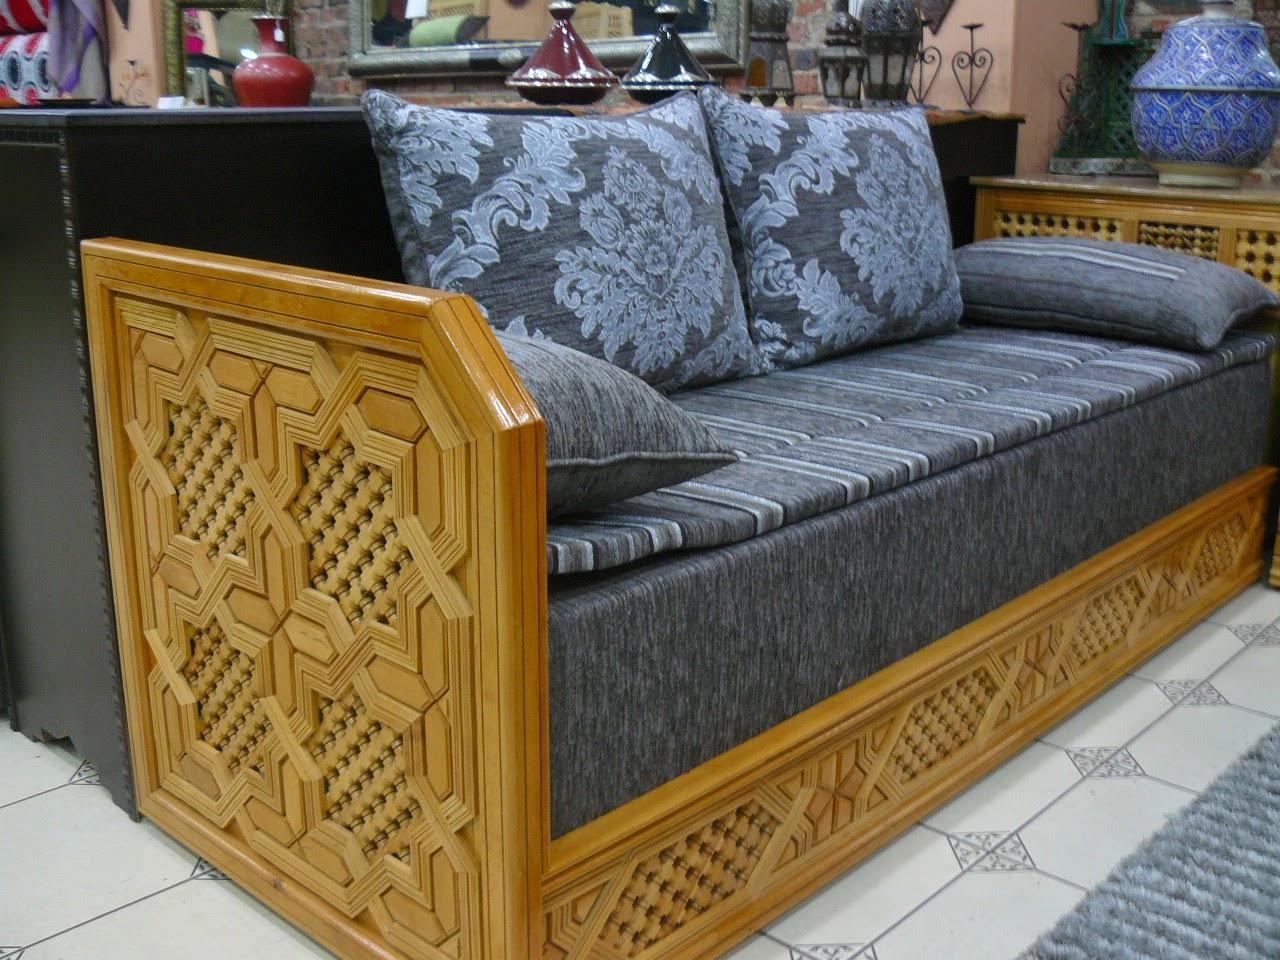 sedari moderne bois decoration marocain 2015 sedari moderne bois decoration m - Sedari Moderne En Bois